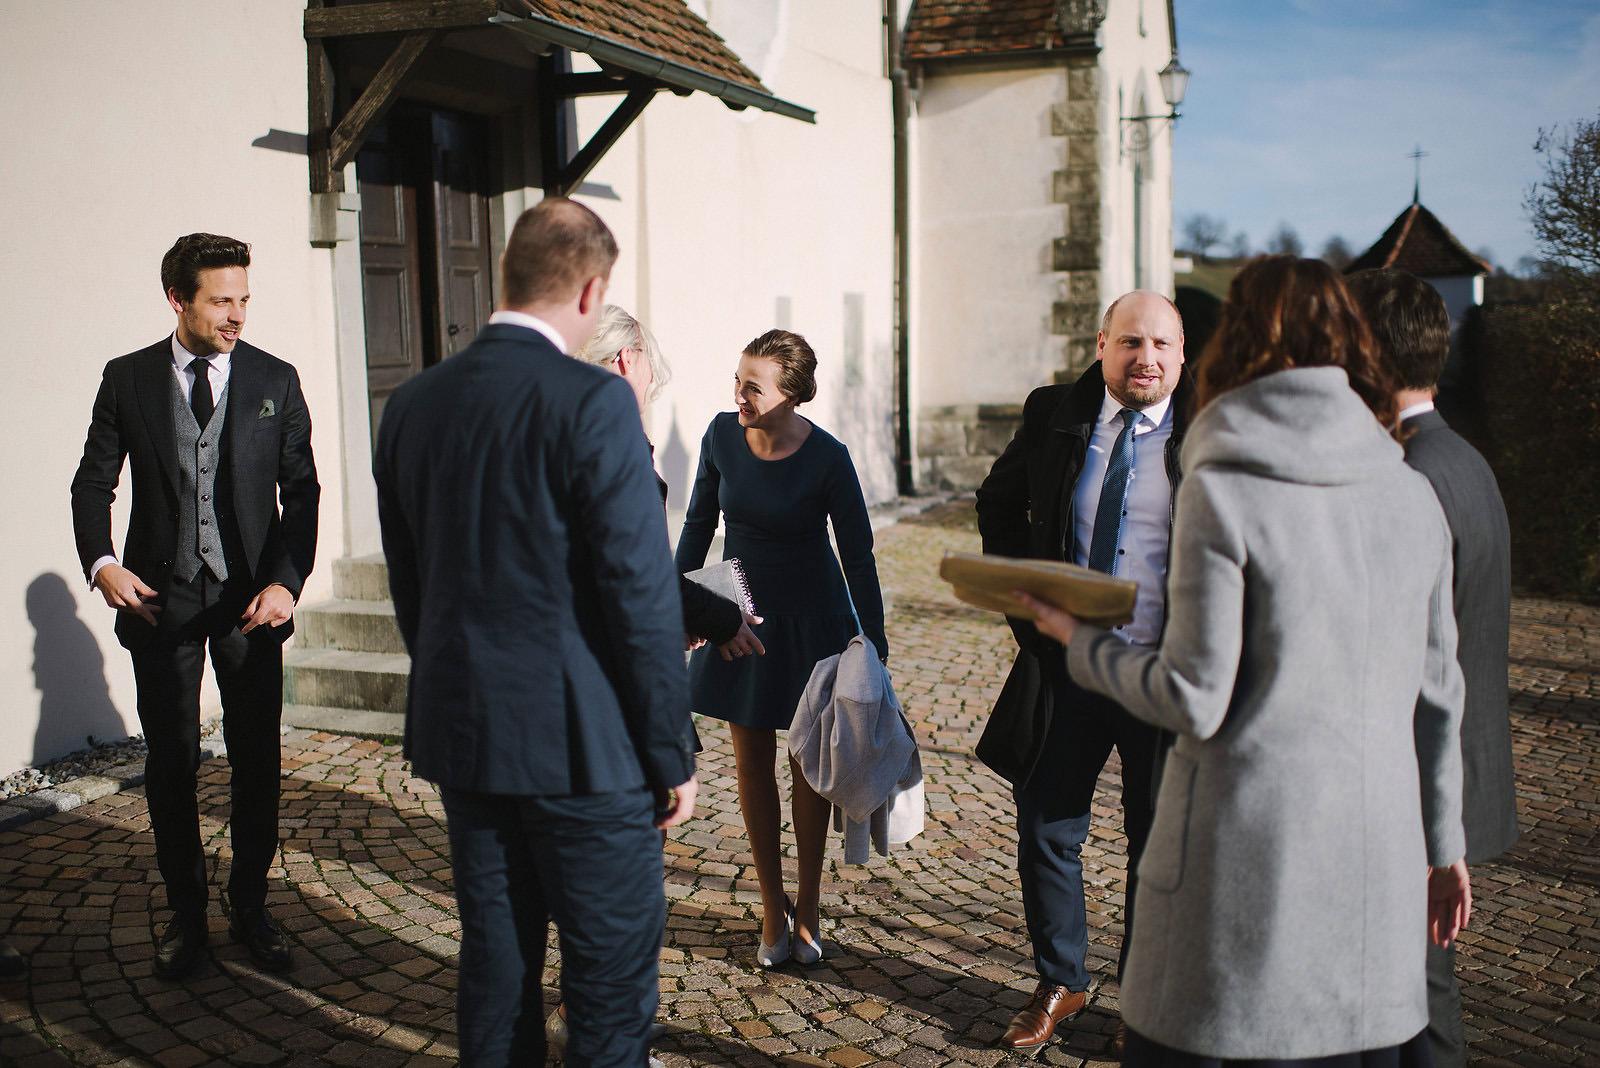 Fotograf Konstanz - Silvester Wedding in Hagnau / Friedrichshafen at Lake of Constance  - 2 -